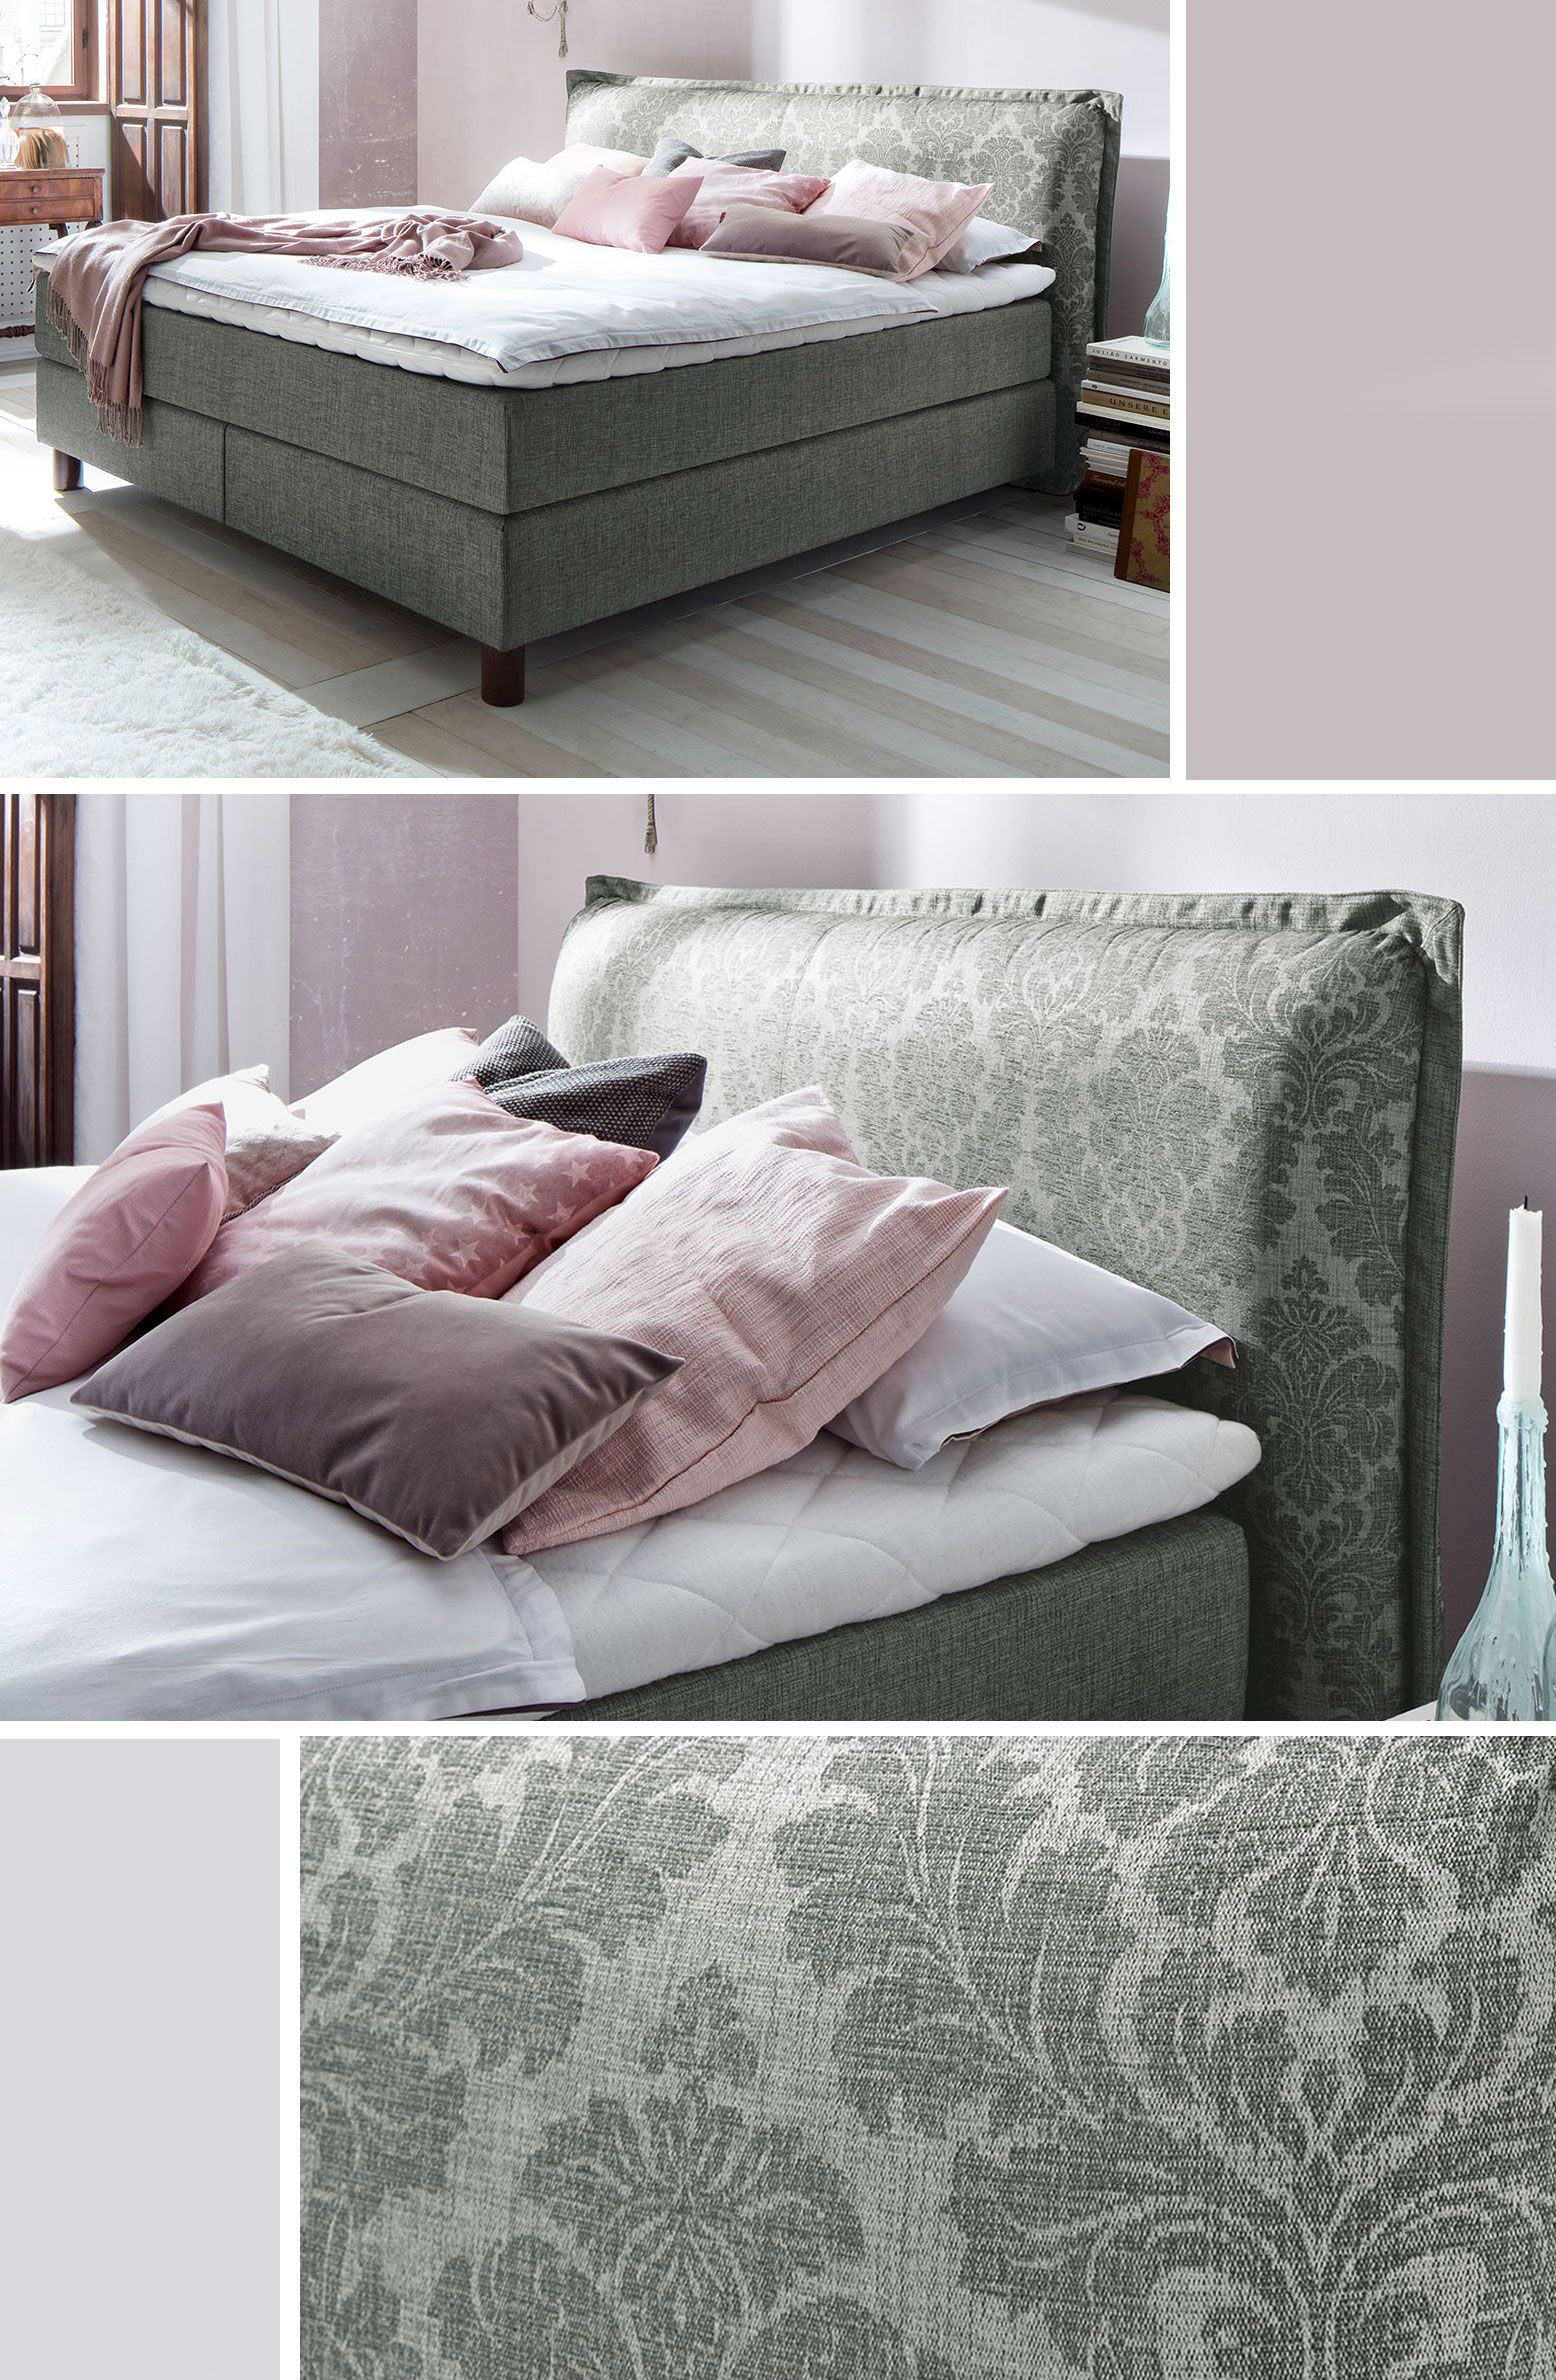 royales boxspringbett mit tollem kopfteil f nf. Black Bedroom Furniture Sets. Home Design Ideas